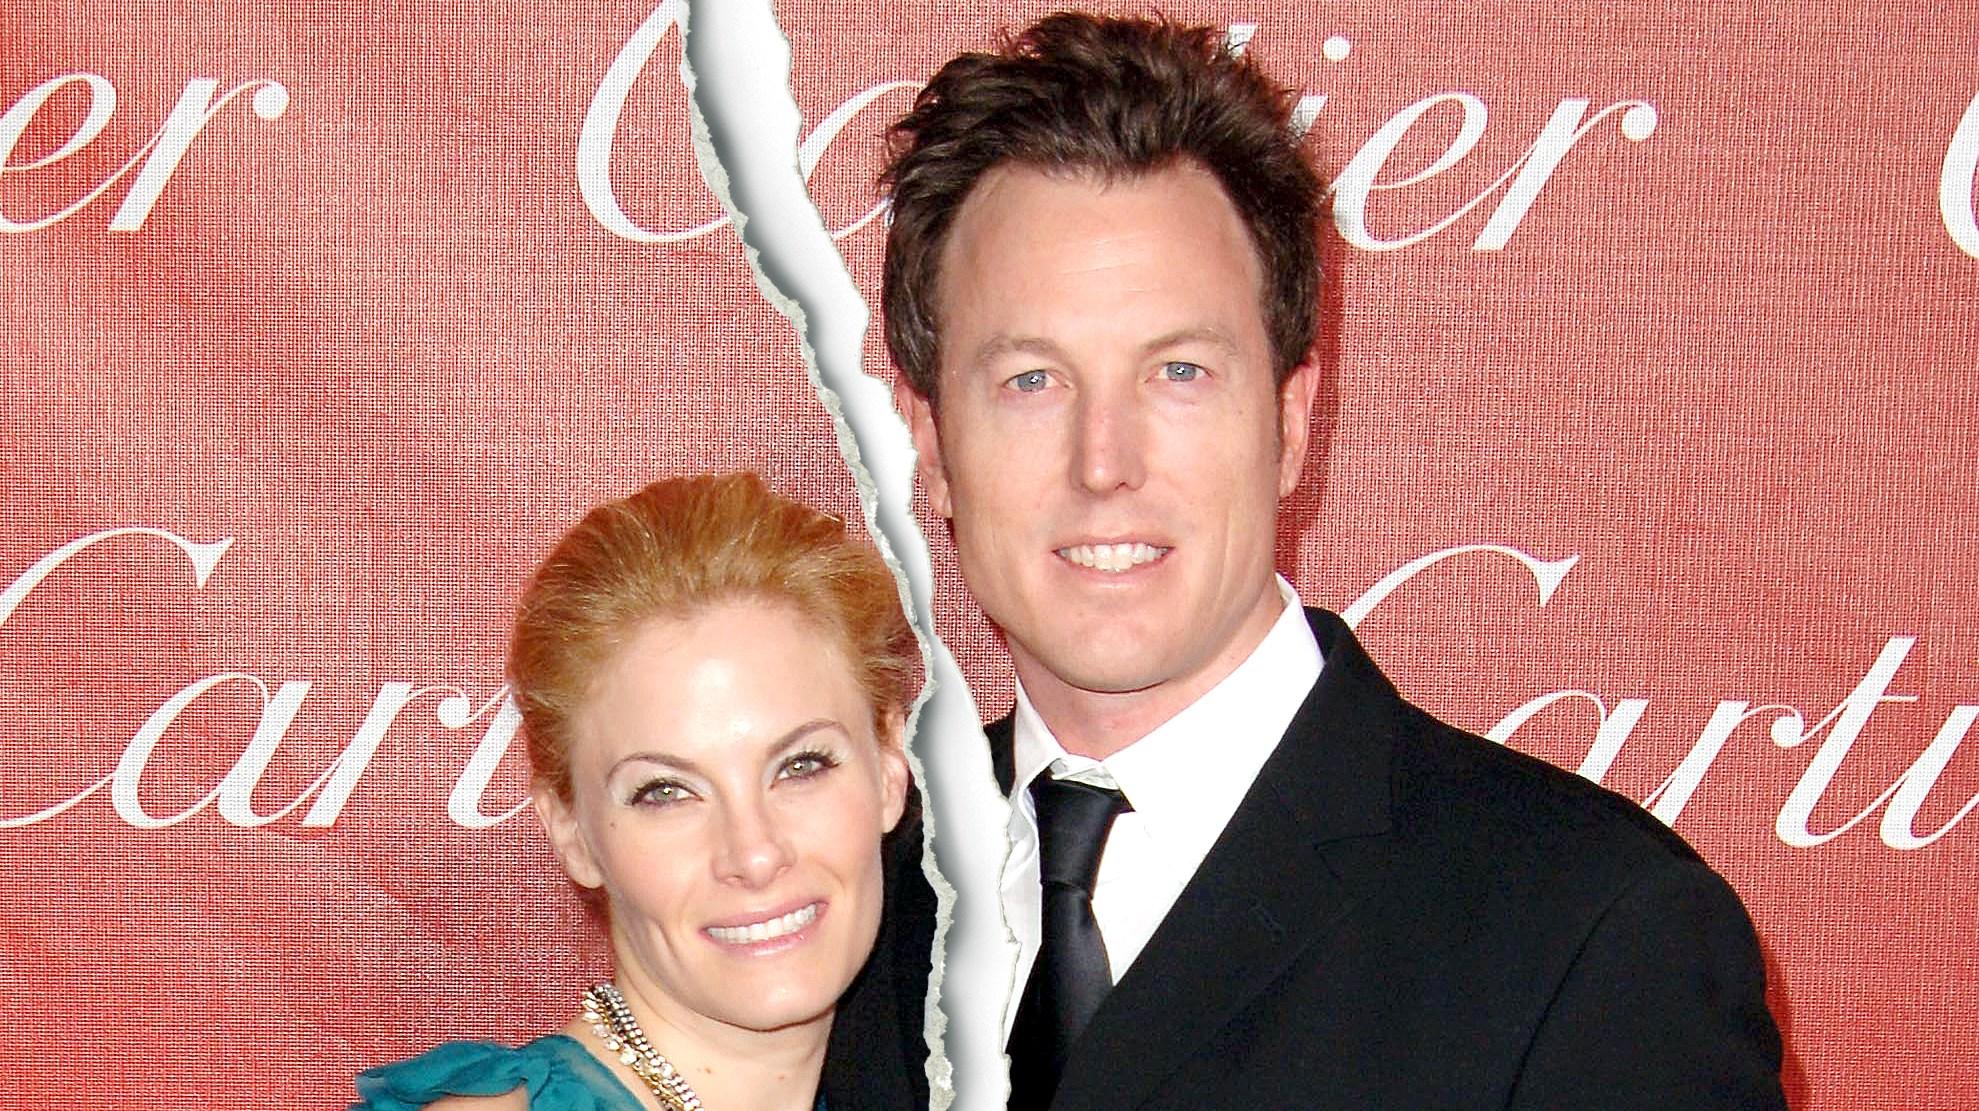 Dean Zanuck and Marisa Zanuck attend the 2011 Palm Springs International Film Festival Awards Gala.